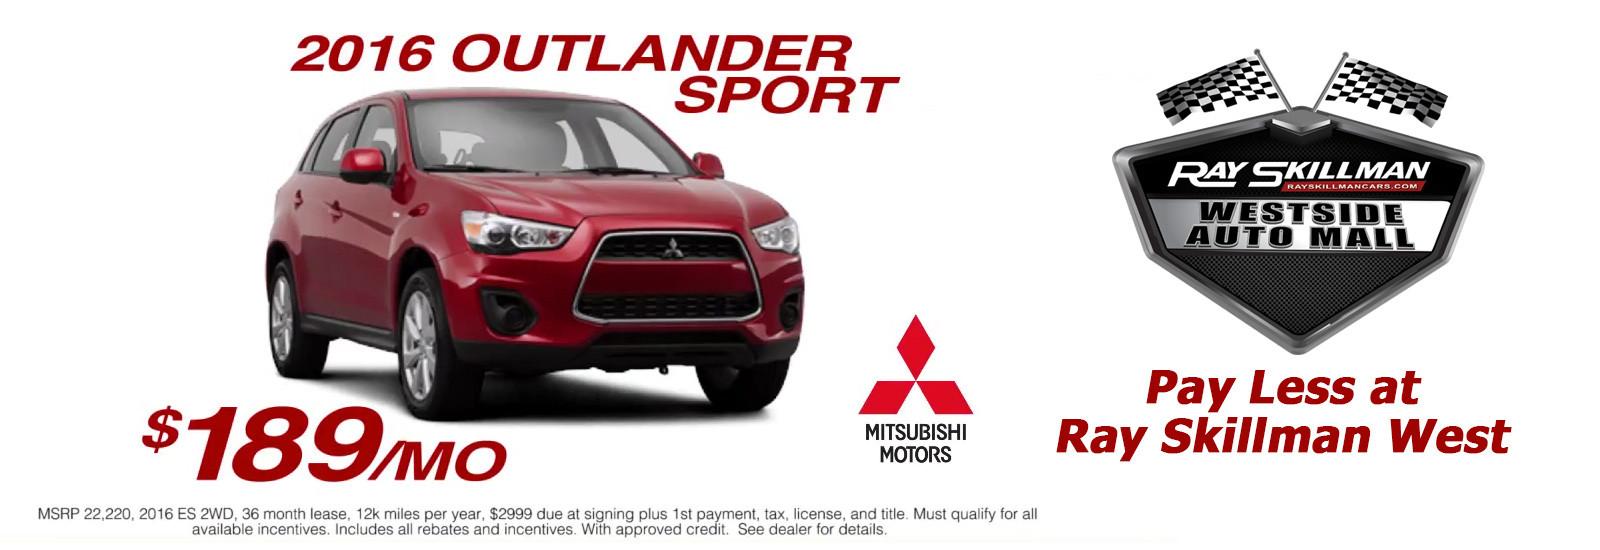 2016 Mitsubishi Outlander Sport $189